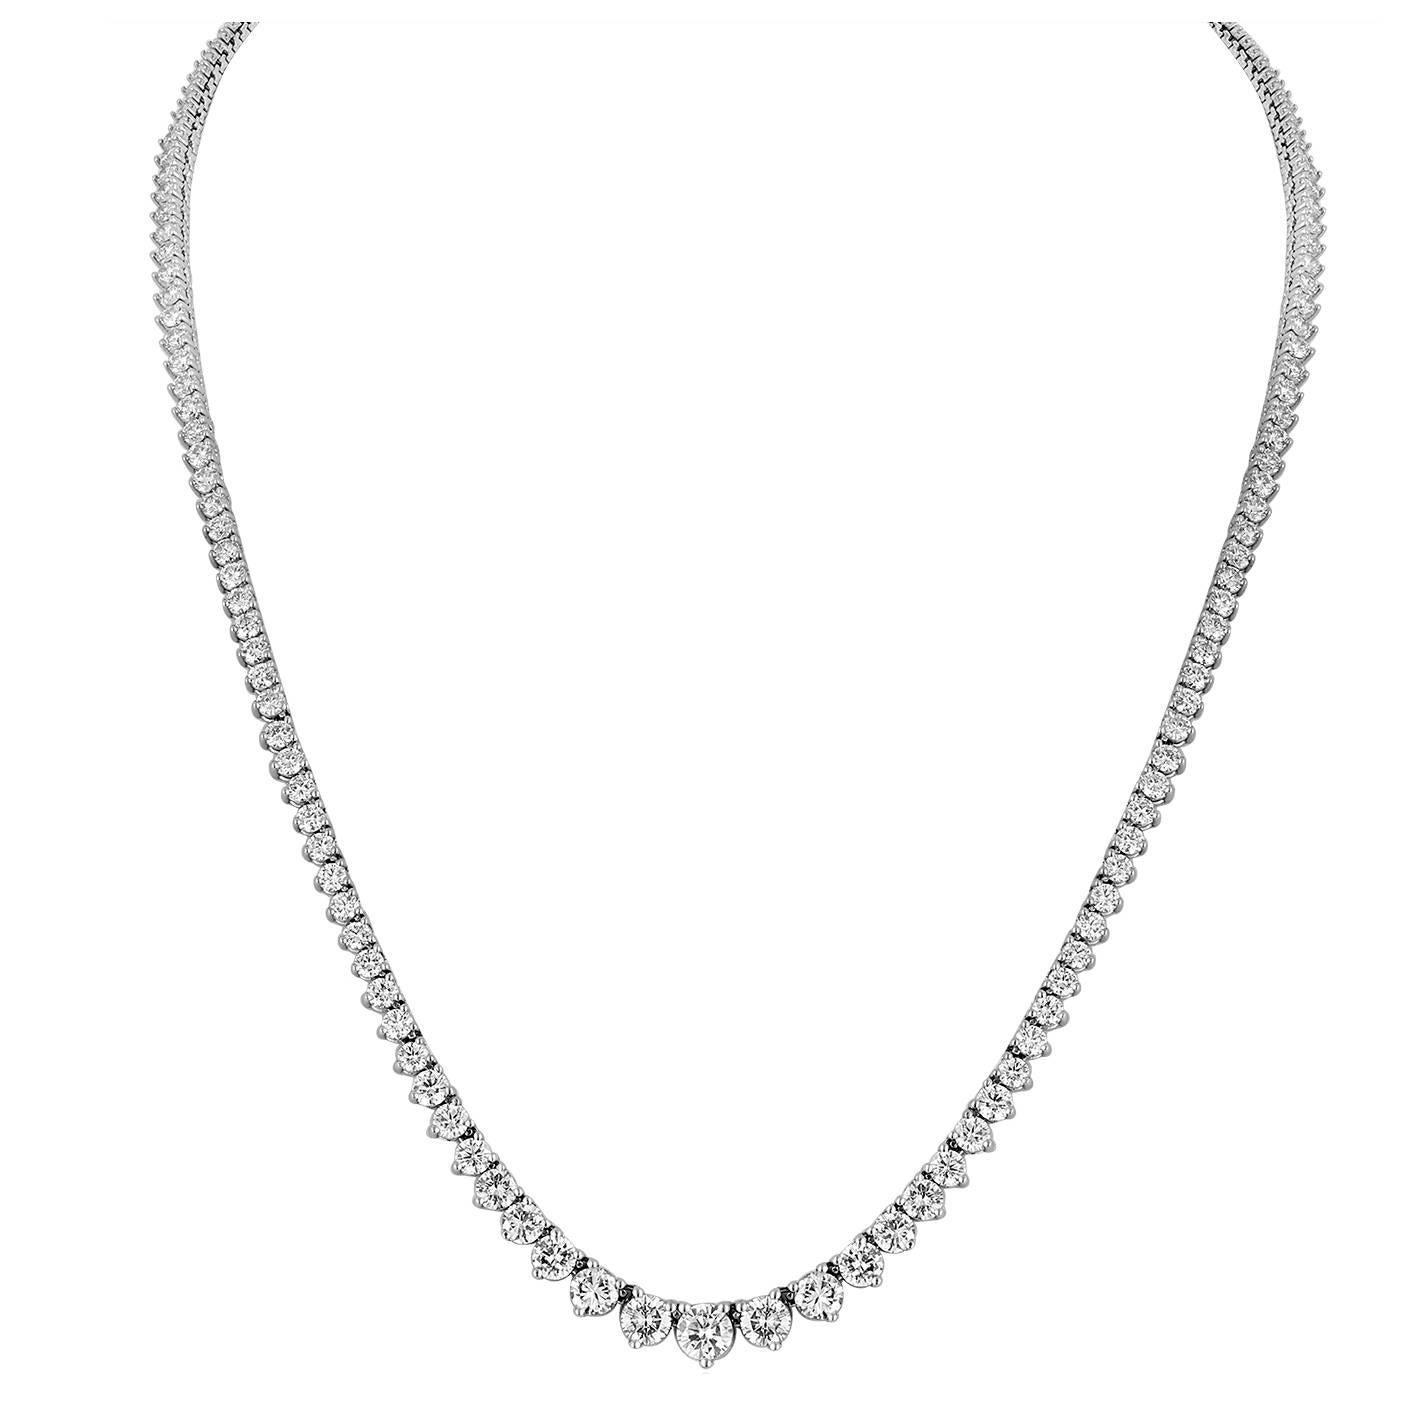 11.86 Carat Diamond Gold Riviere Necklace